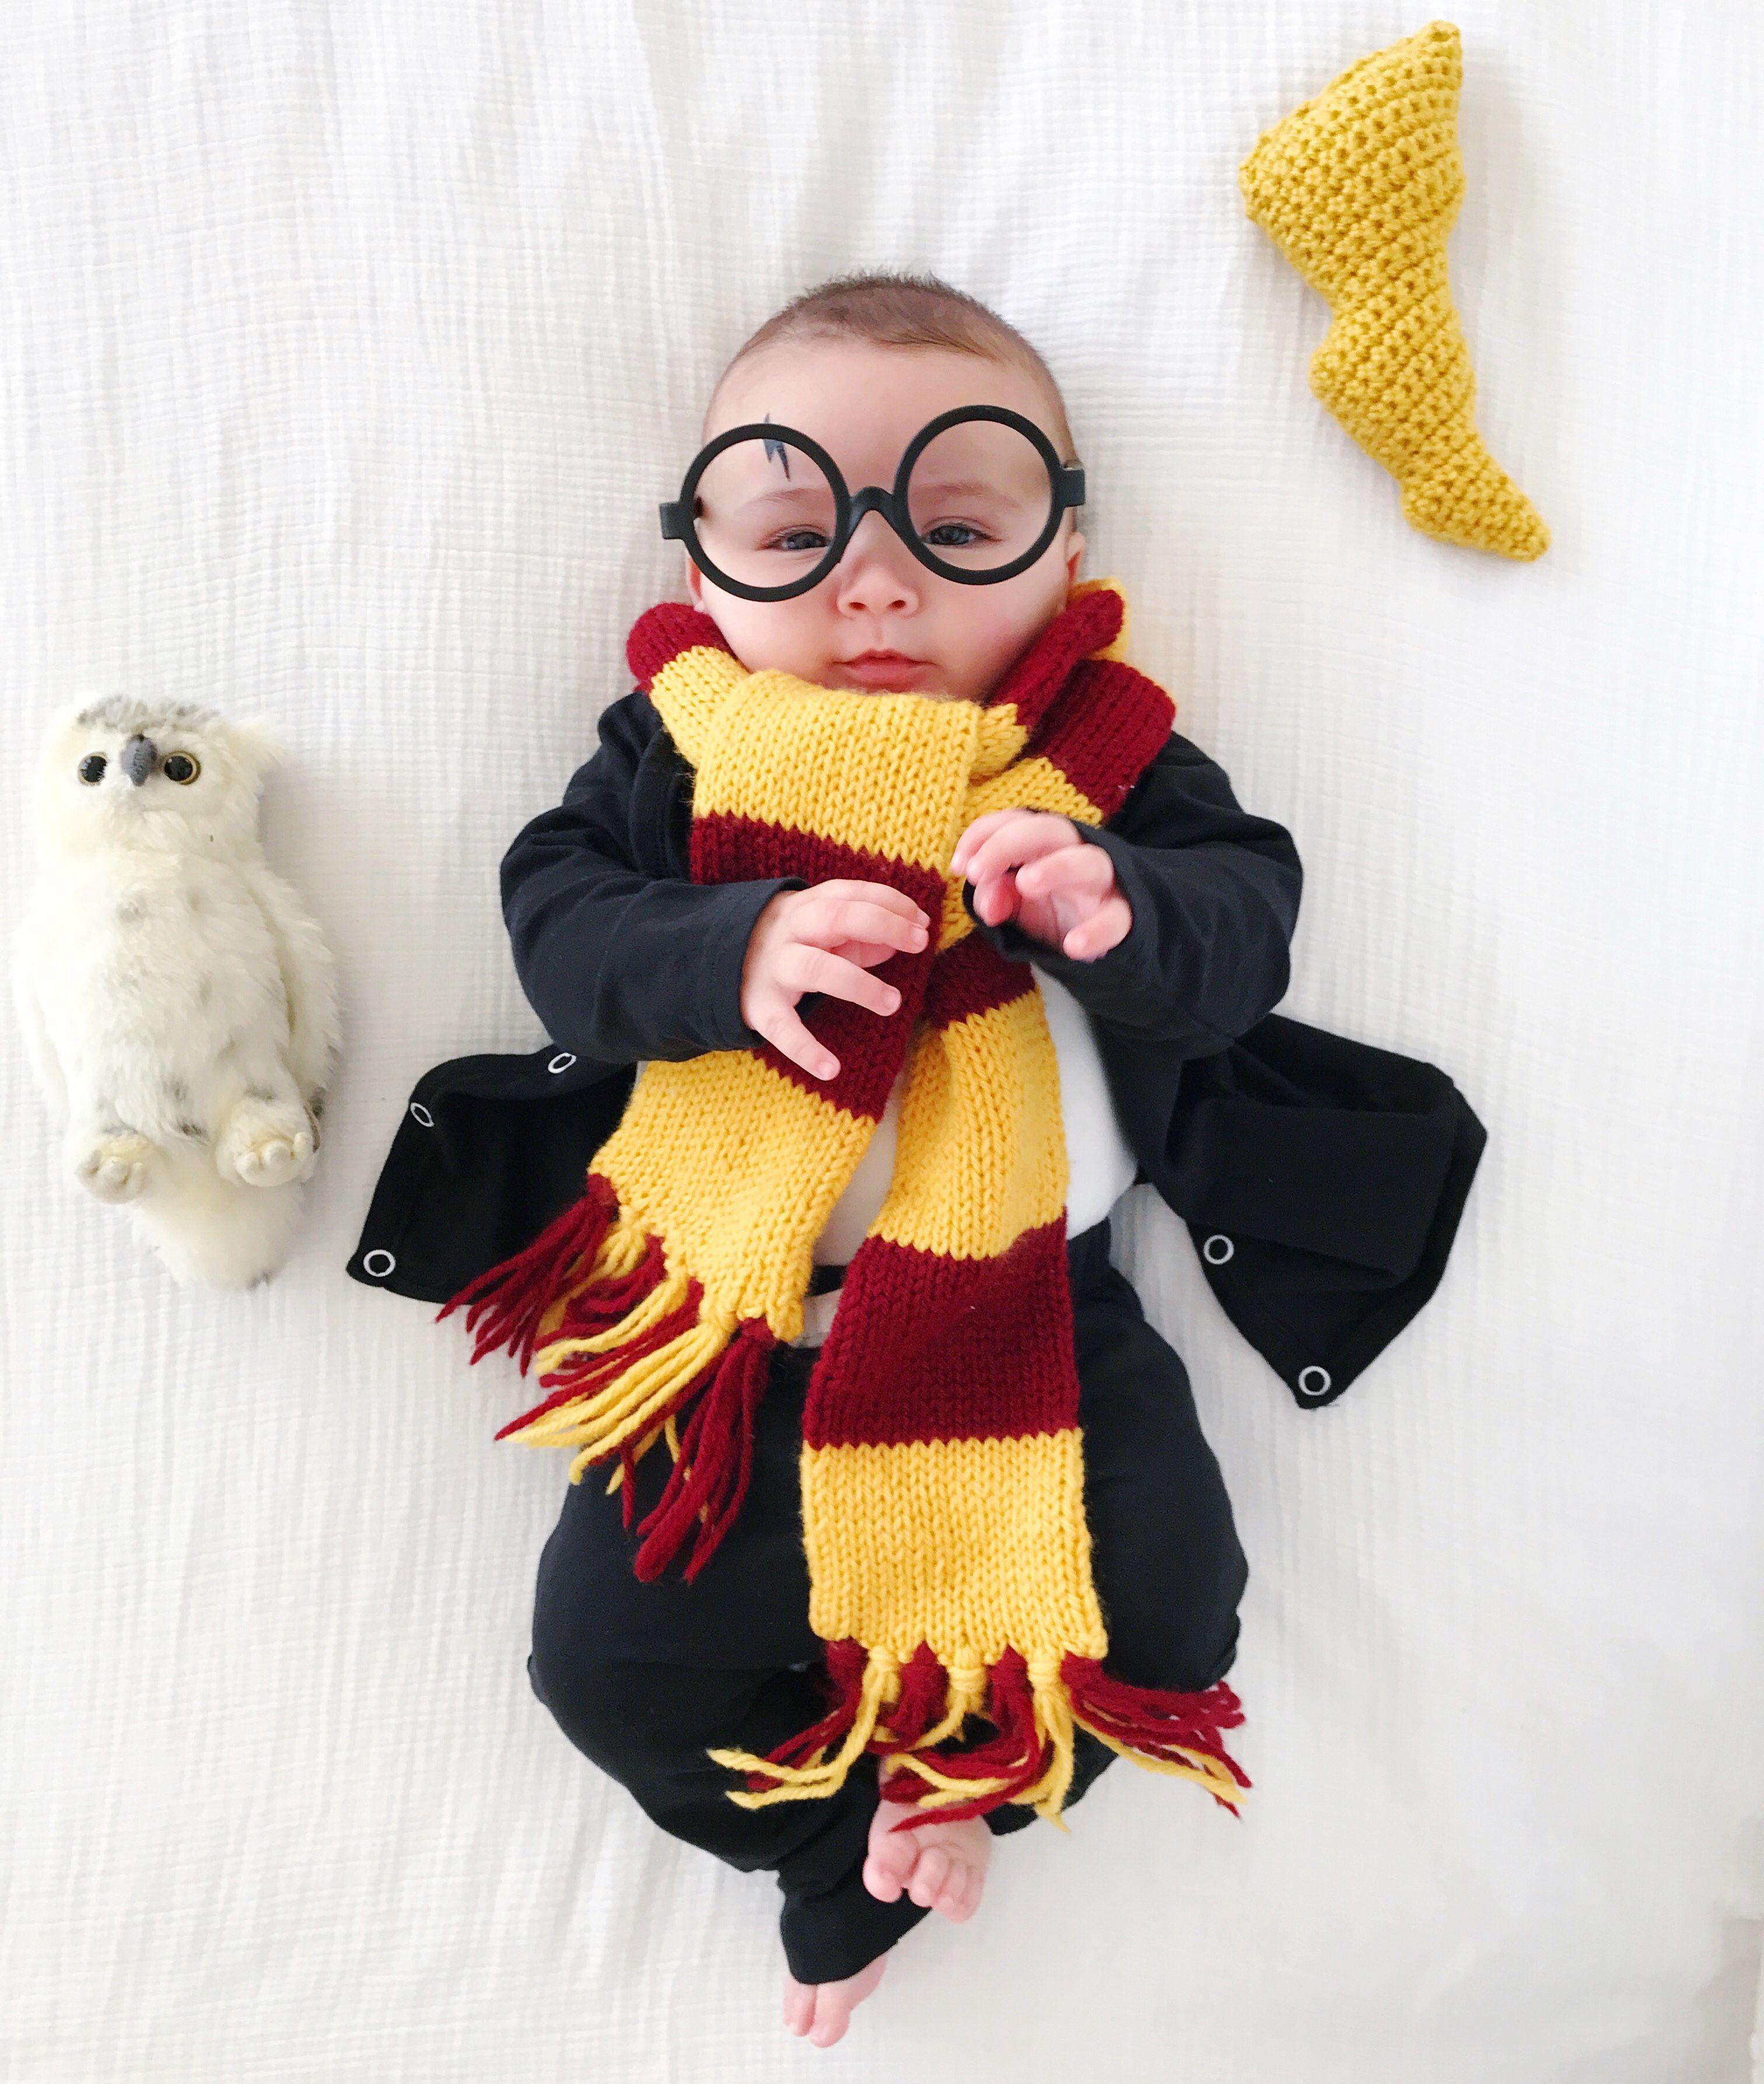 cute diy baby halloween costume ideas - best homemade infant